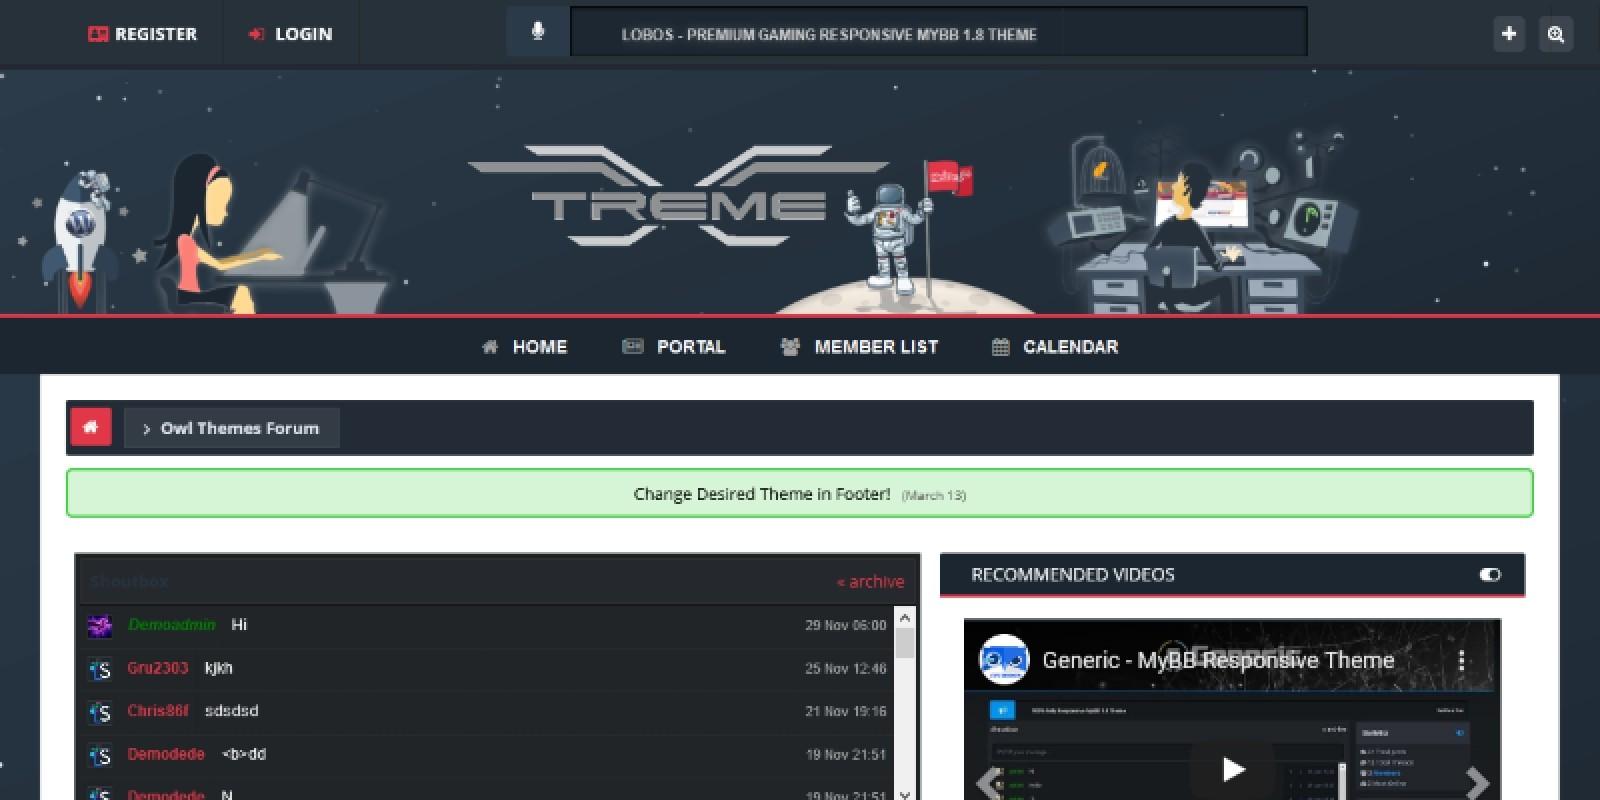 xTreme – MyBB Theme